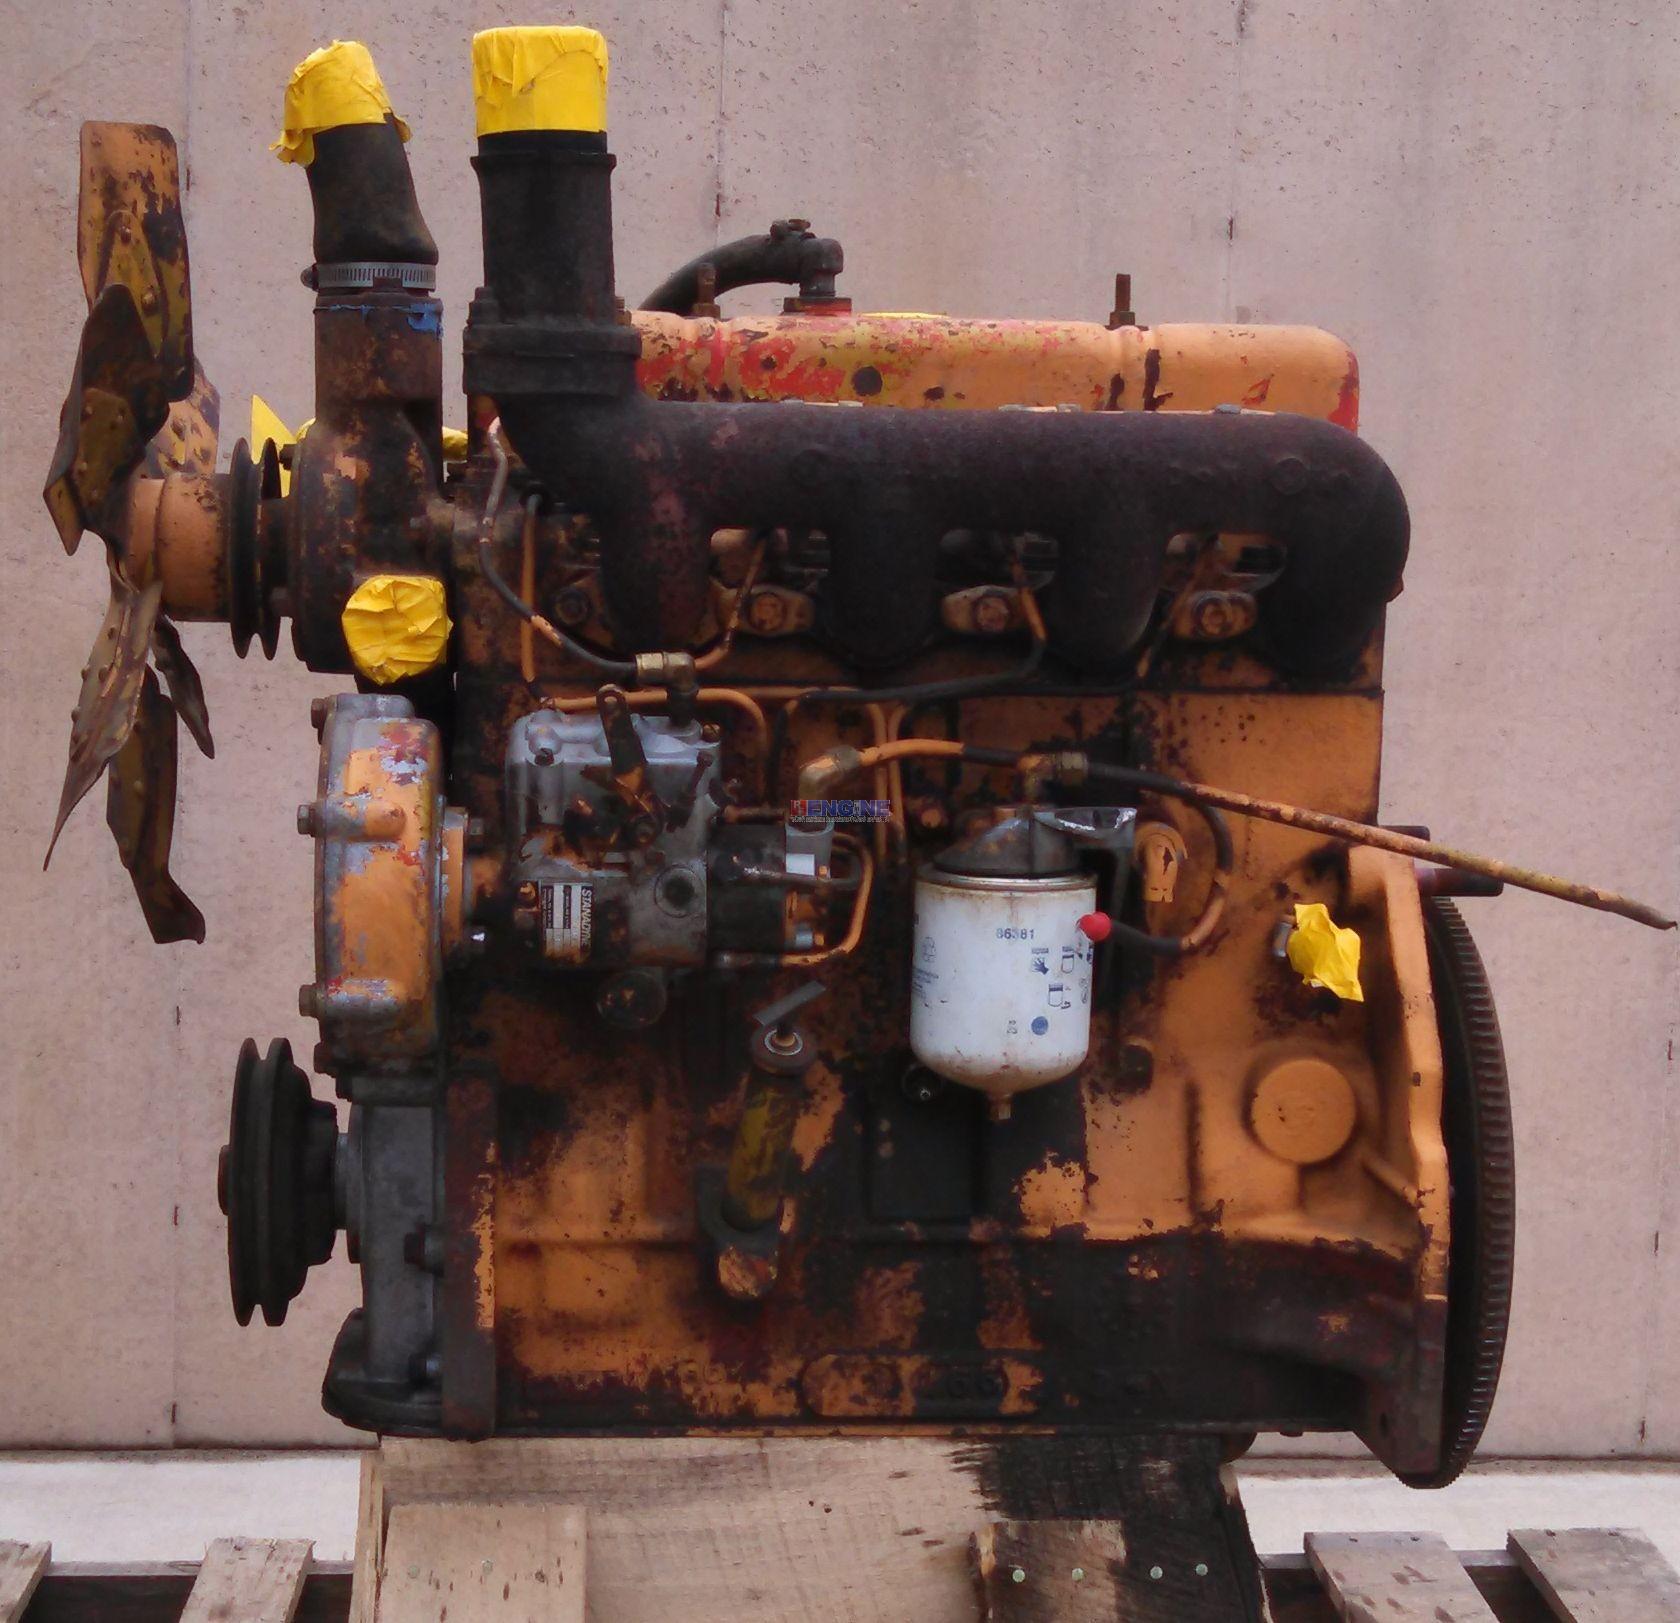 Case 207 Engine Good Running Block A136813 Test Ran 10 13